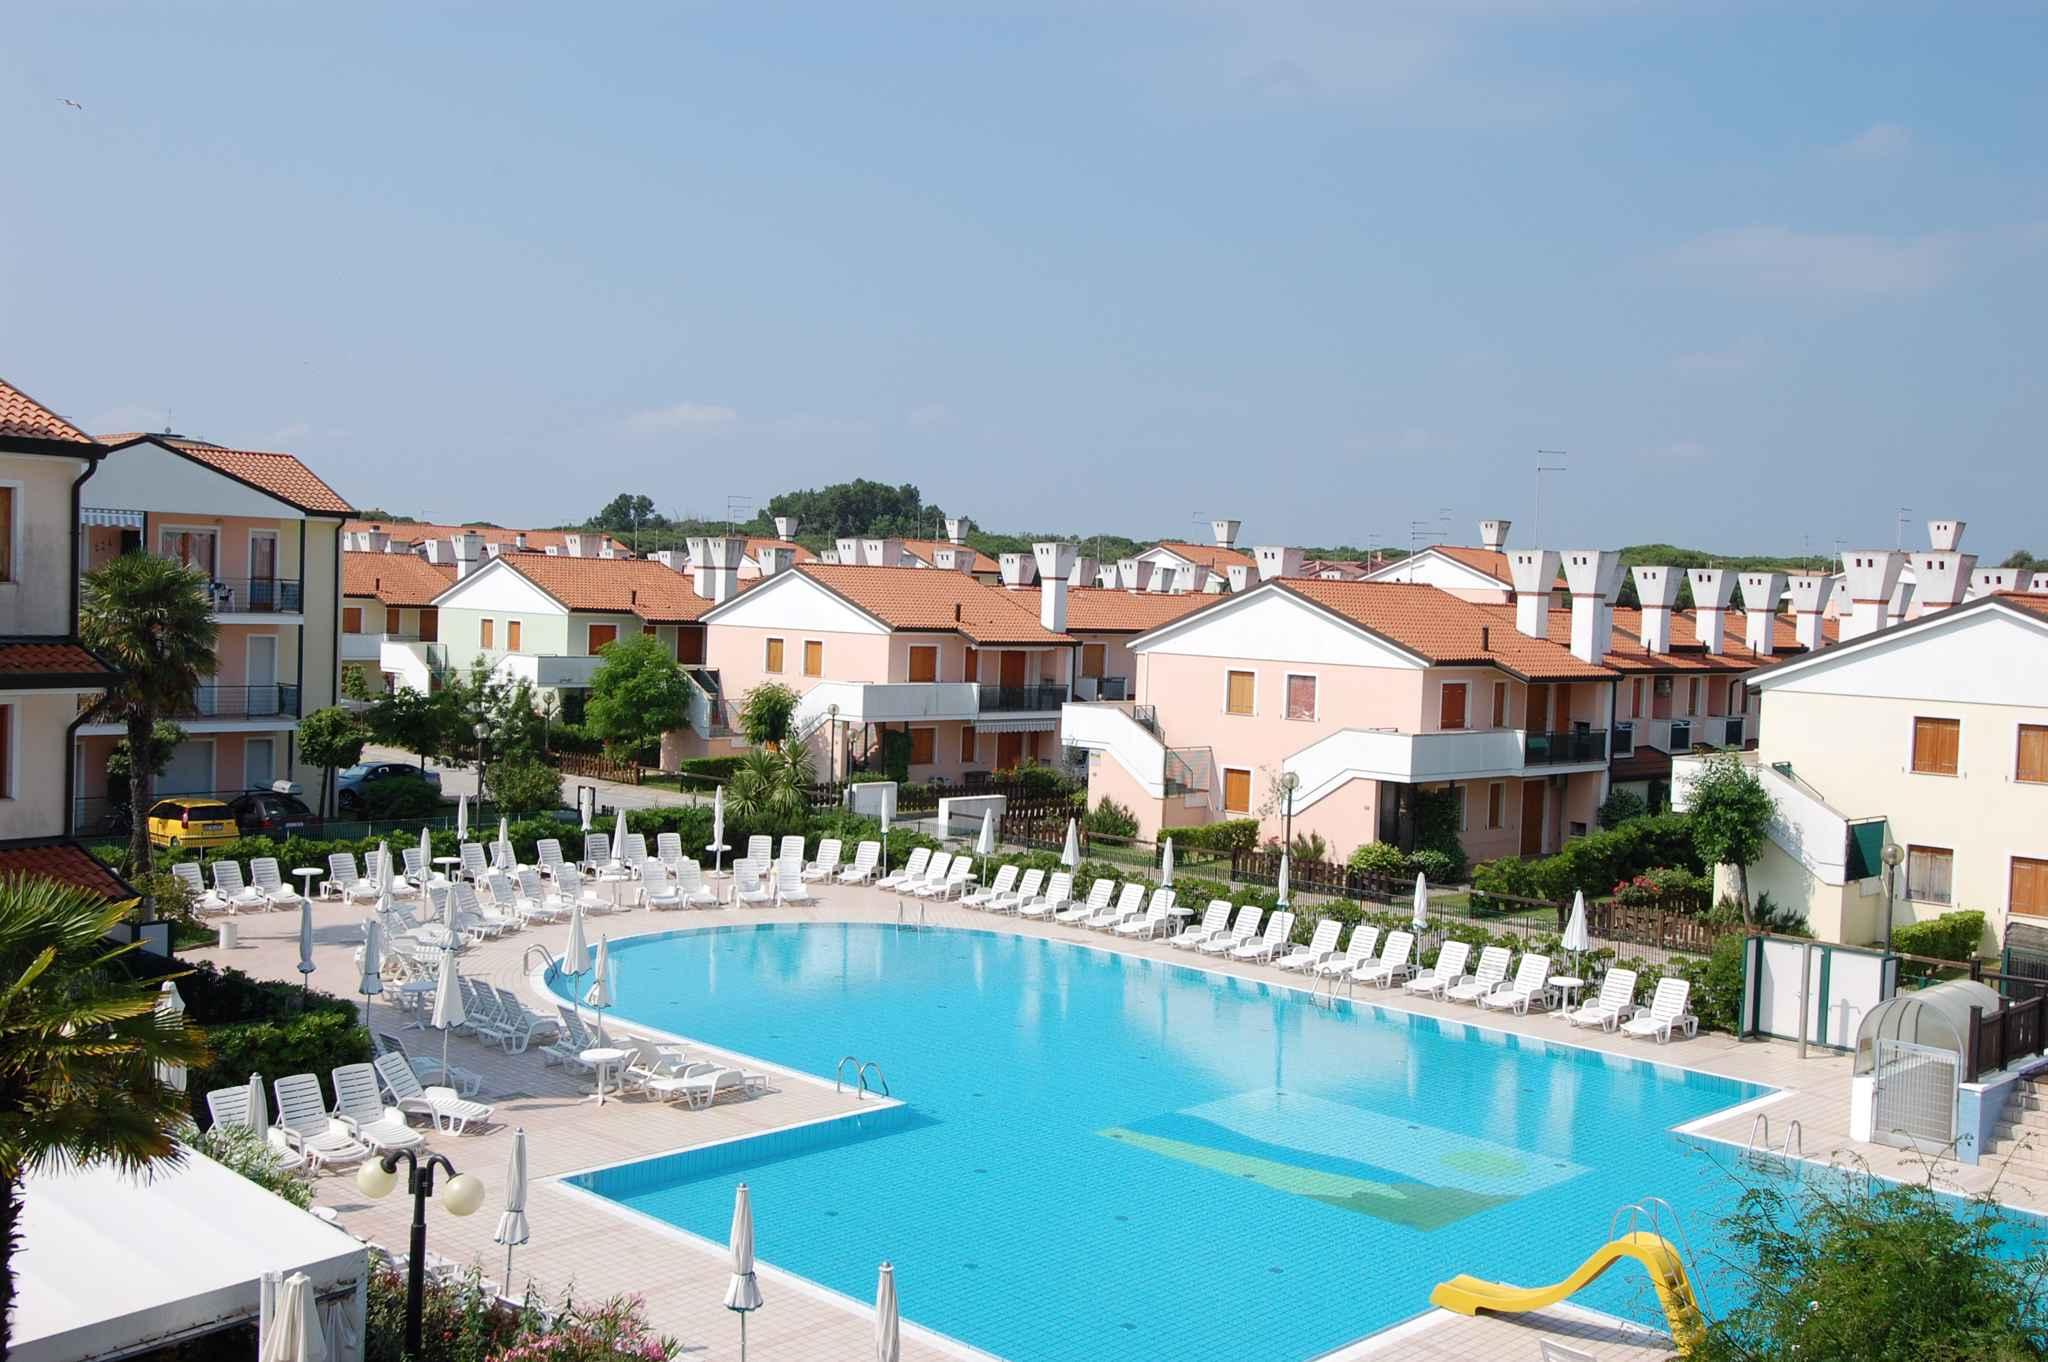 Ferienhaus mit Pool und Grill (284304), Rosolina Mare, Rovigo, Venetien, Italien, Bild 1